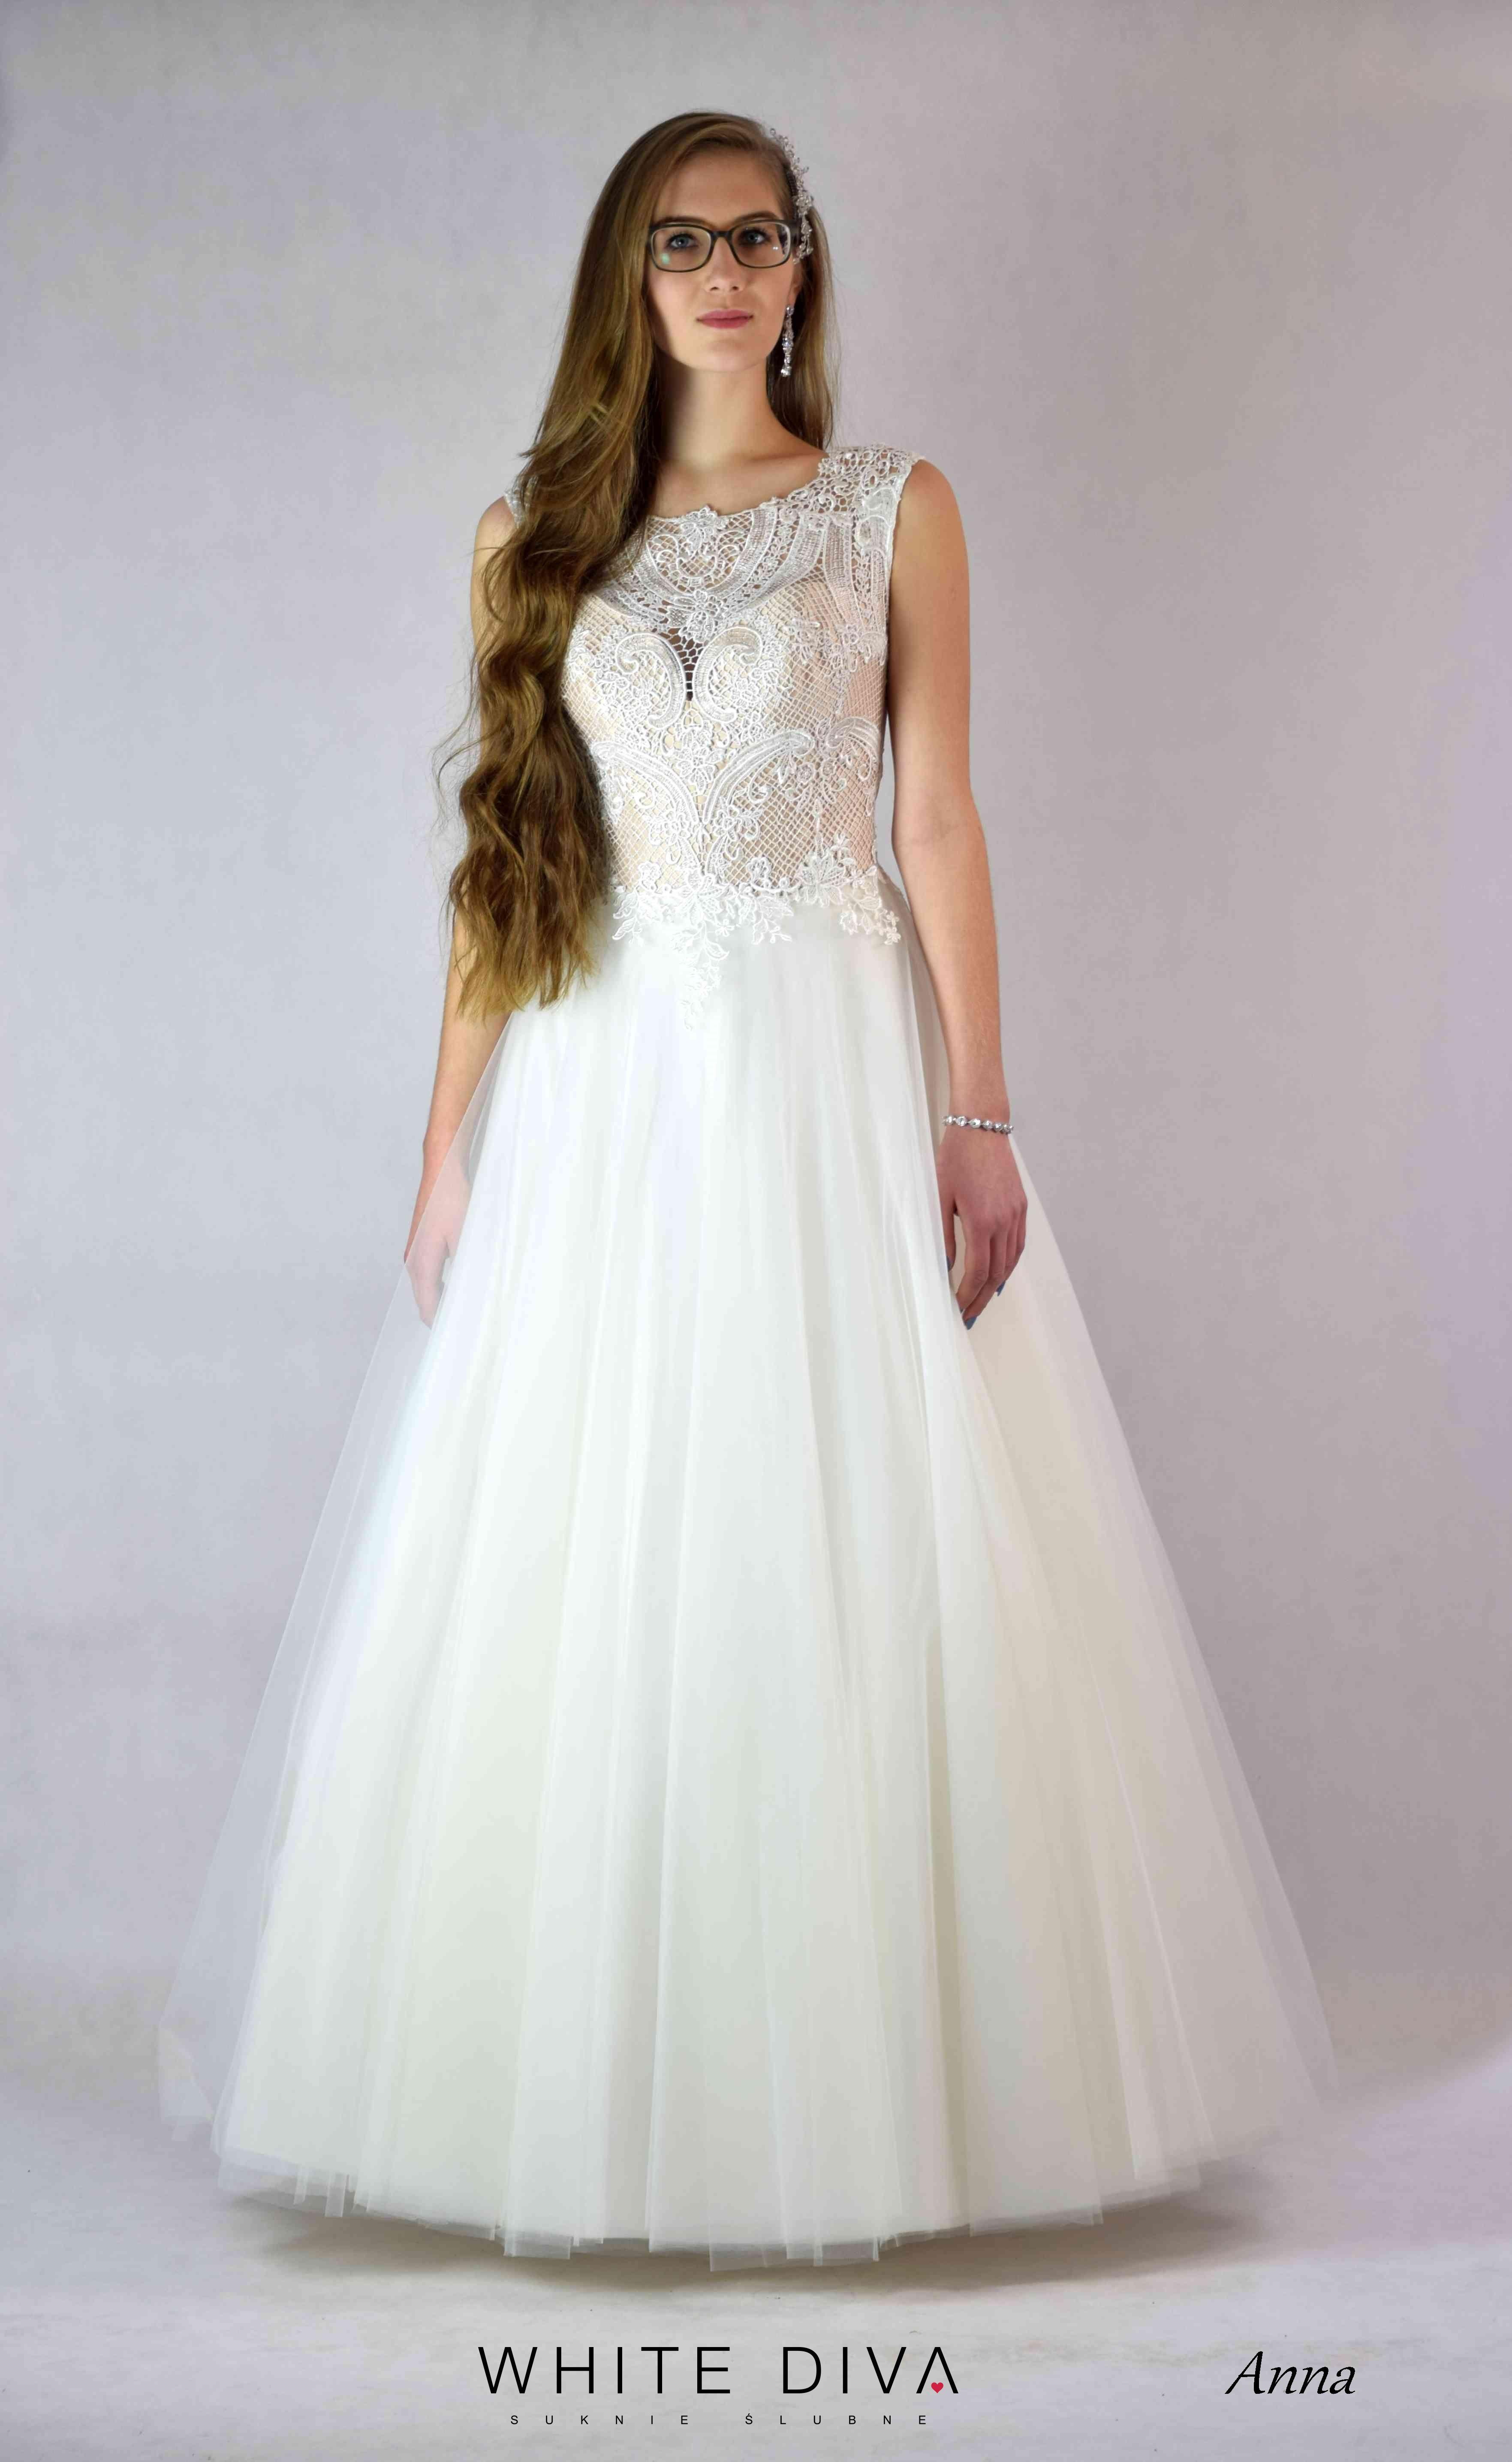 bridal dress Anna from White Diva   suknie   Pinterest   Diva and ...